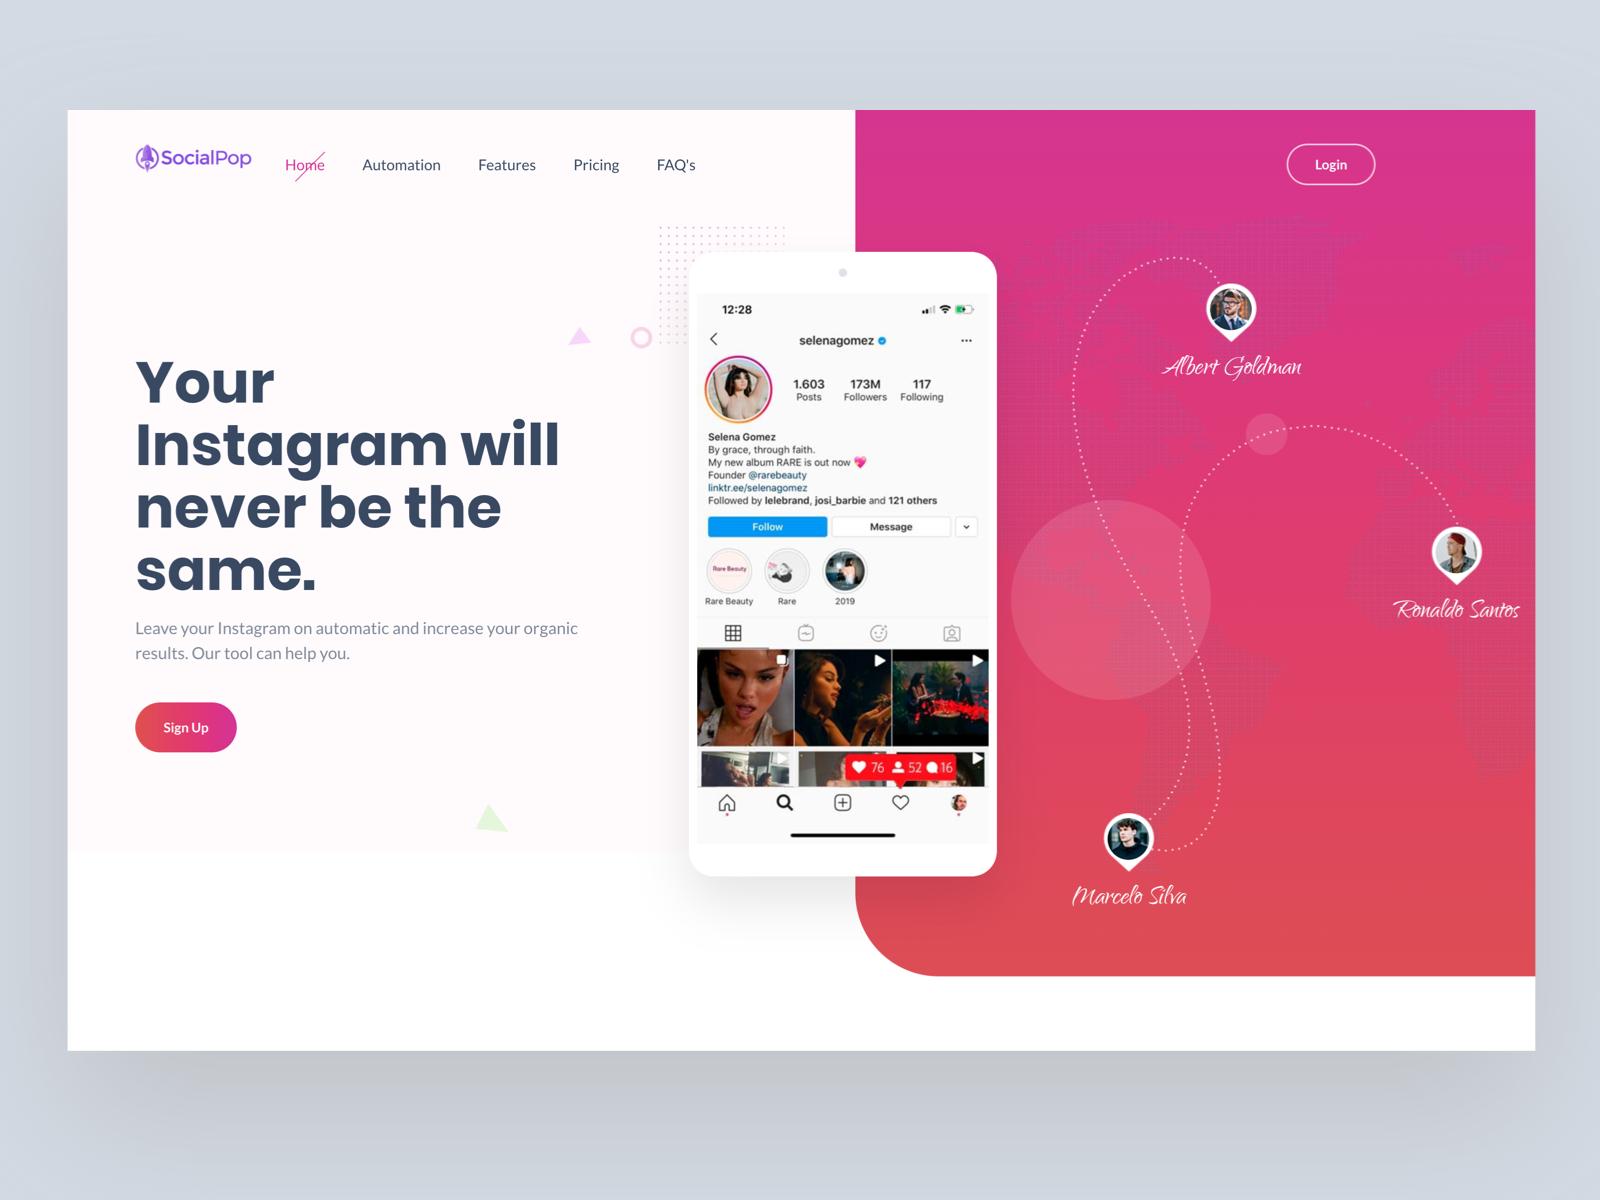 Social Pop Branding And Web Design Development By Shakil Ali For 11thagency On Dribbble